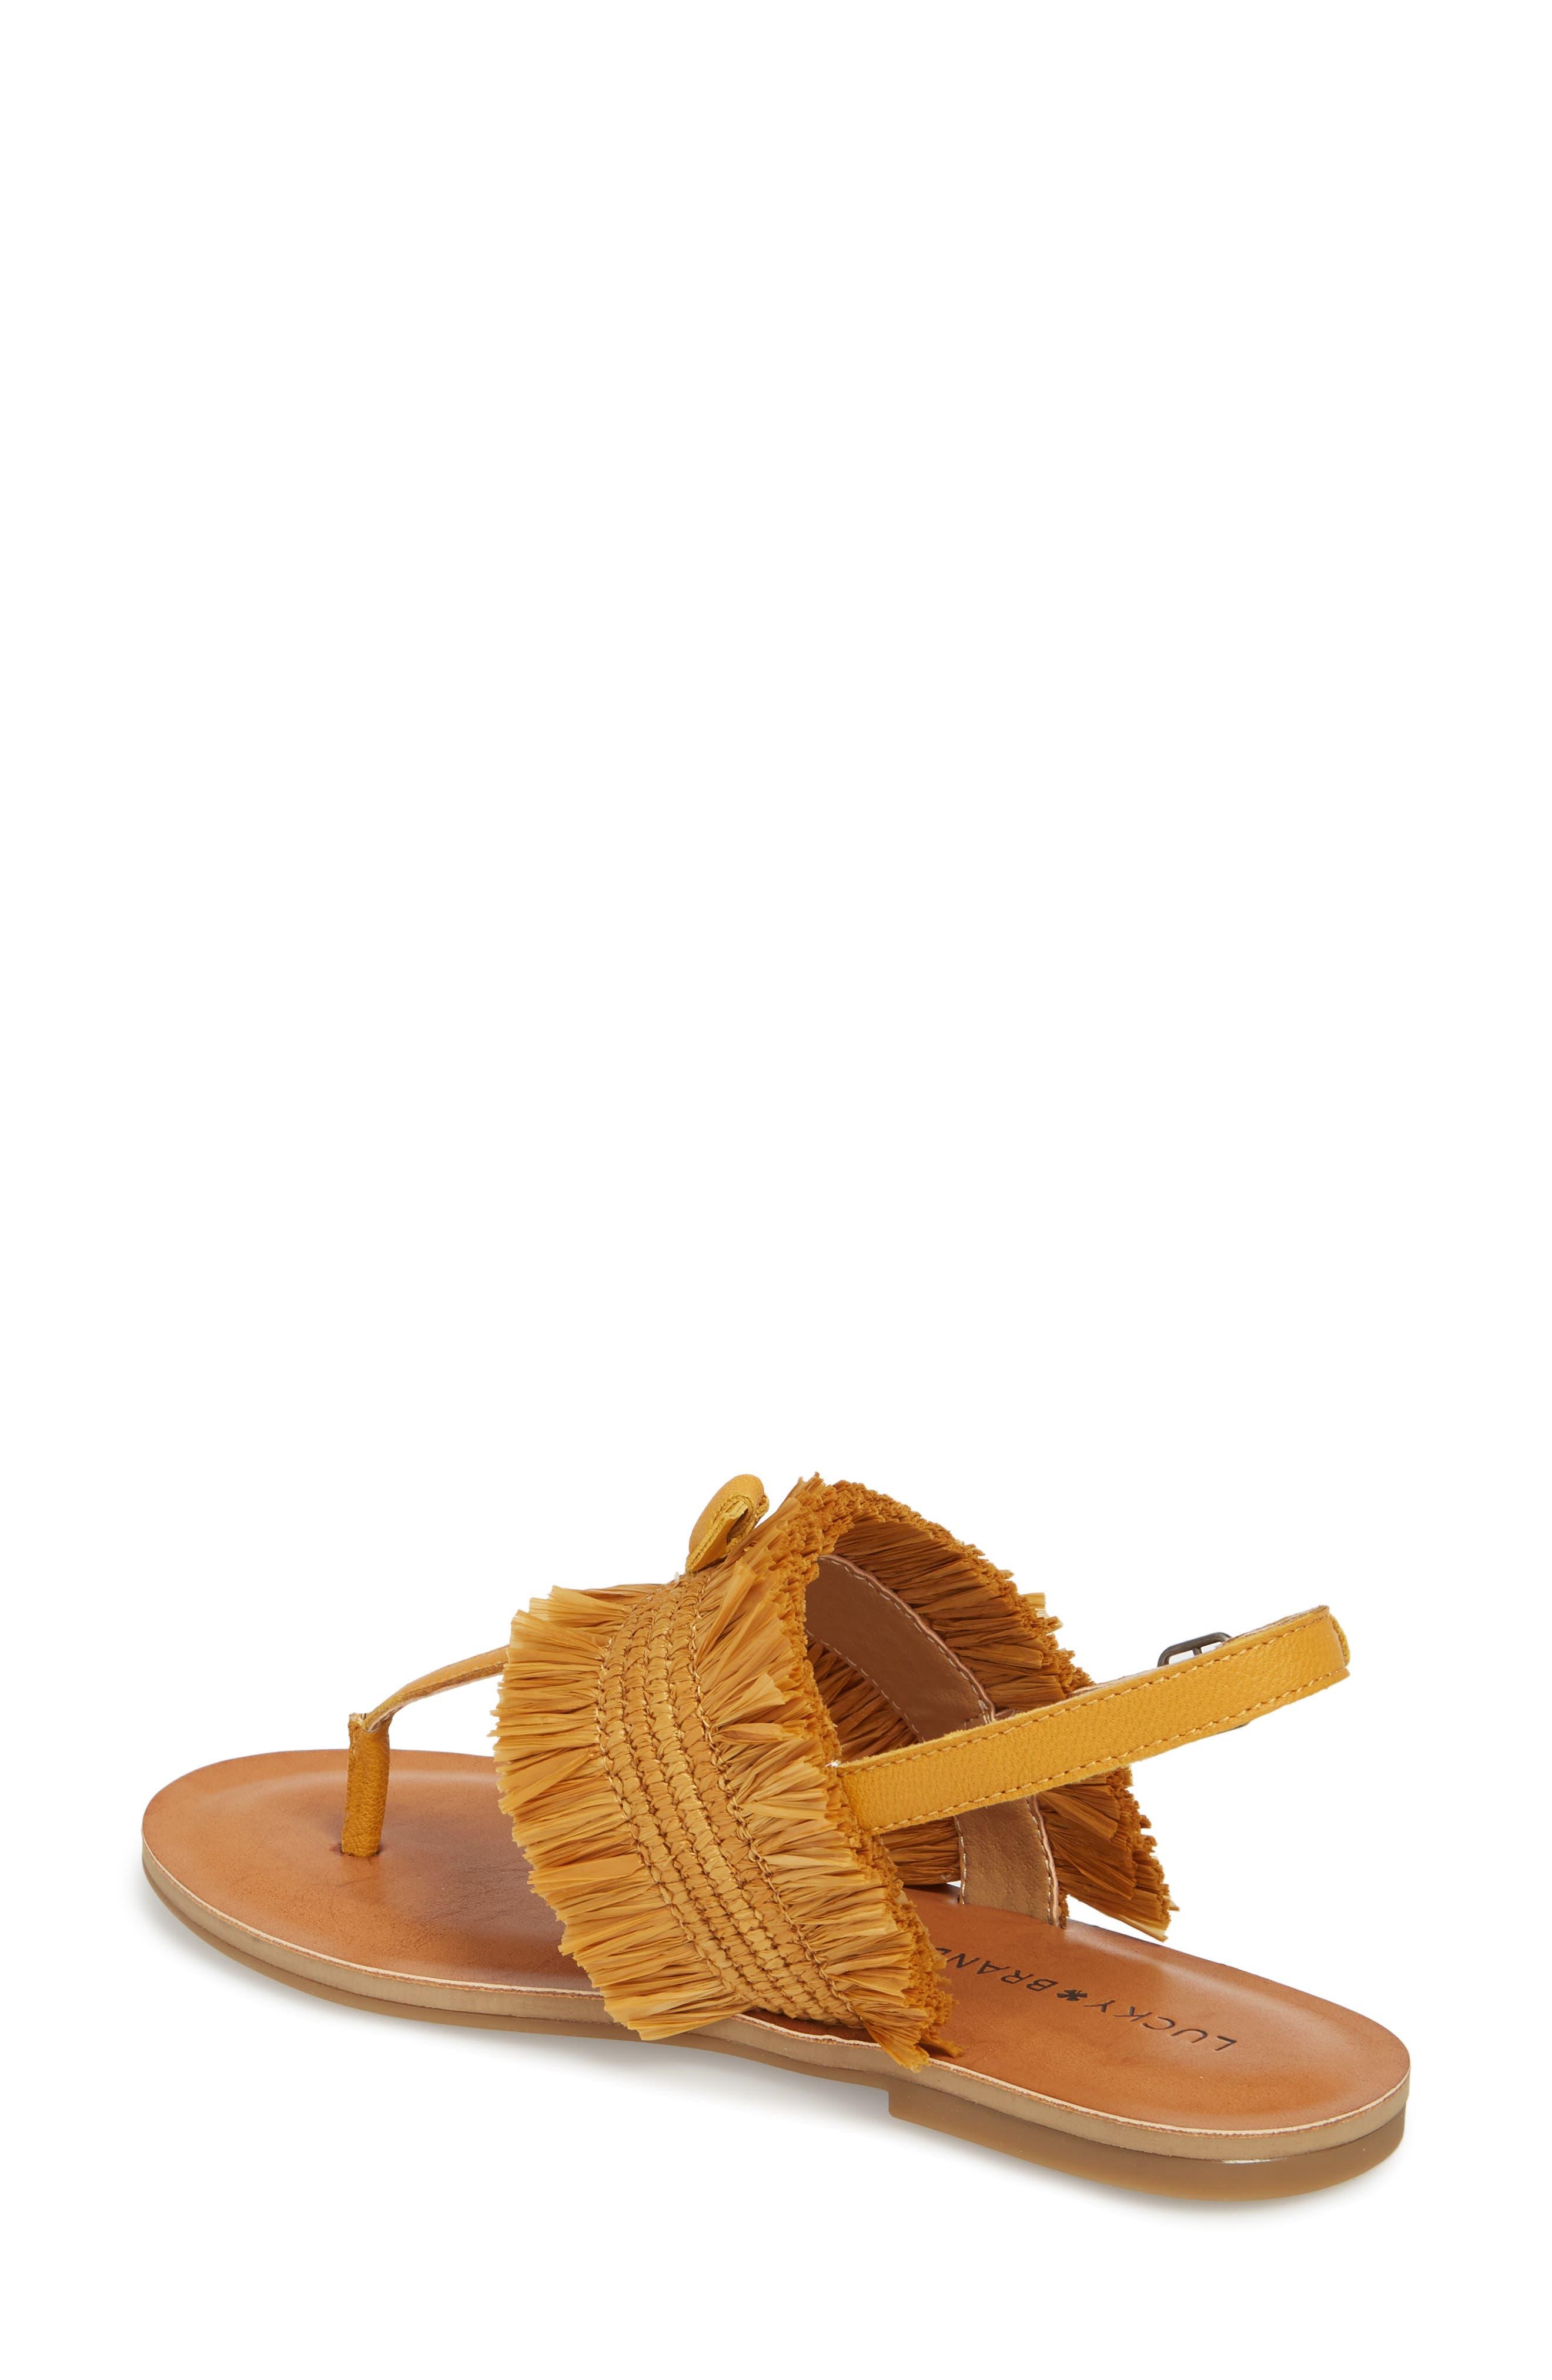 Akerlei Sandal,                             Alternate thumbnail 2, color,                             Saffron Leather